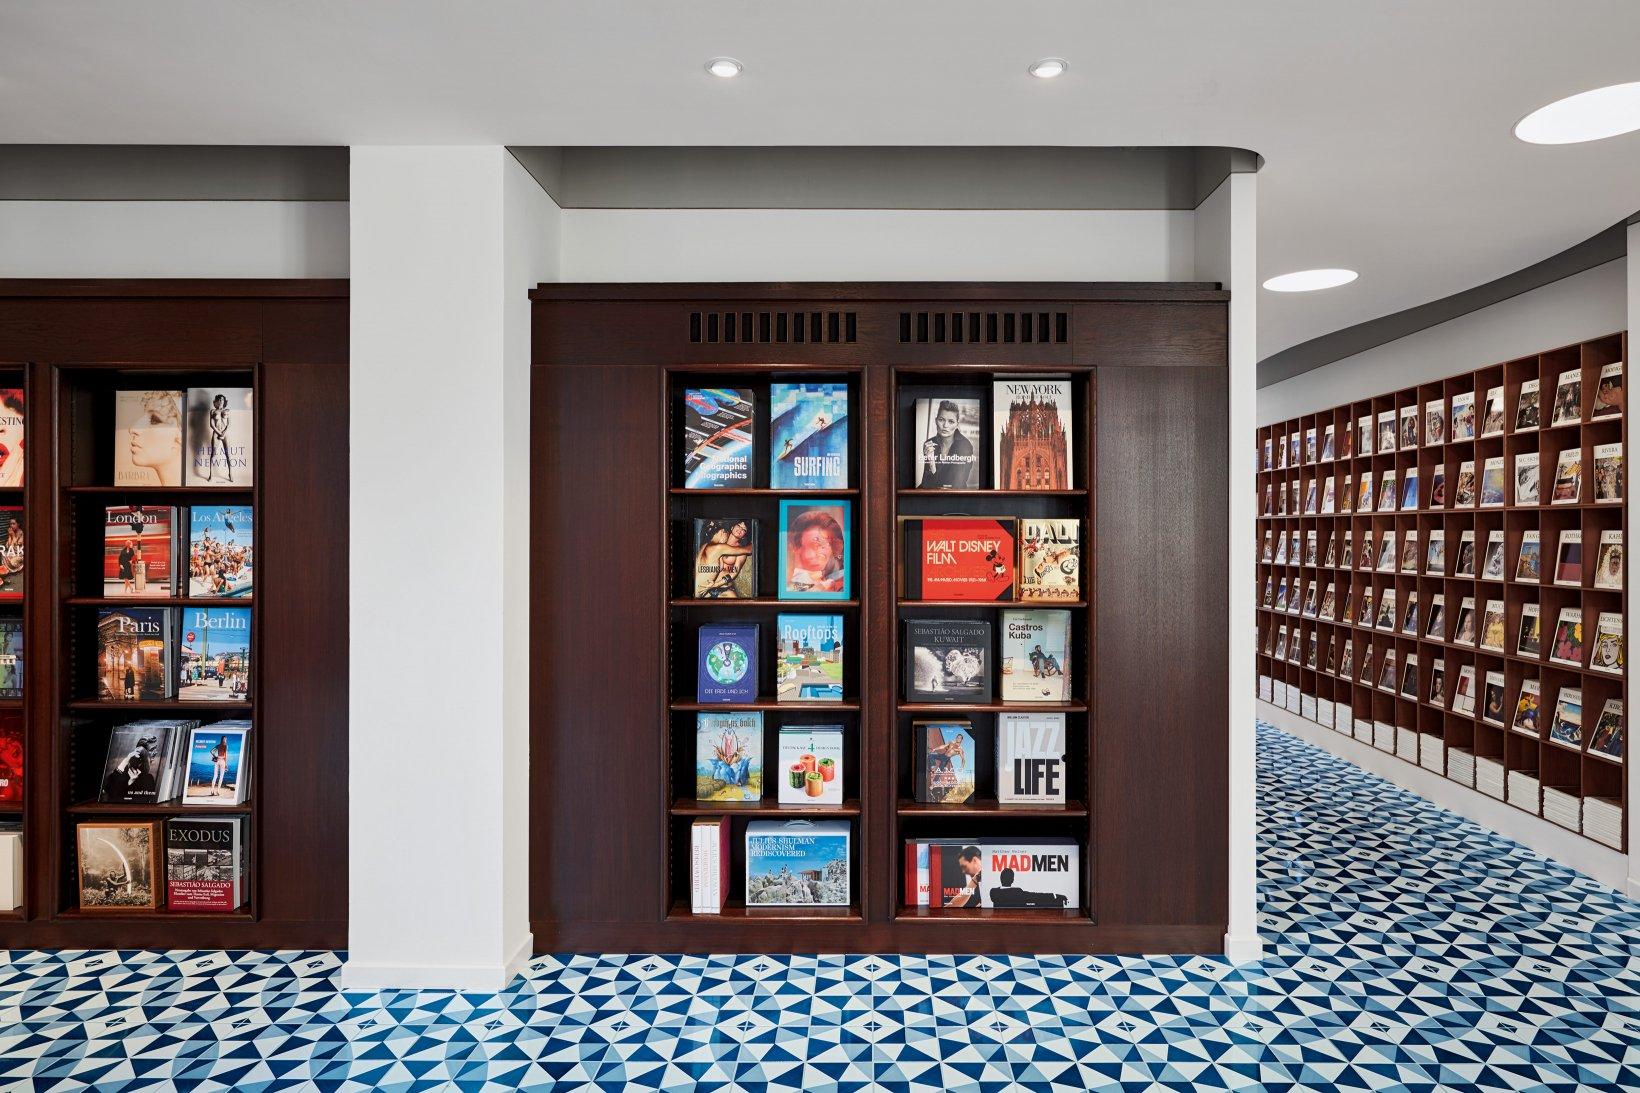 taschen verlag store berlin. Black Bedroom Furniture Sets. Home Design Ideas